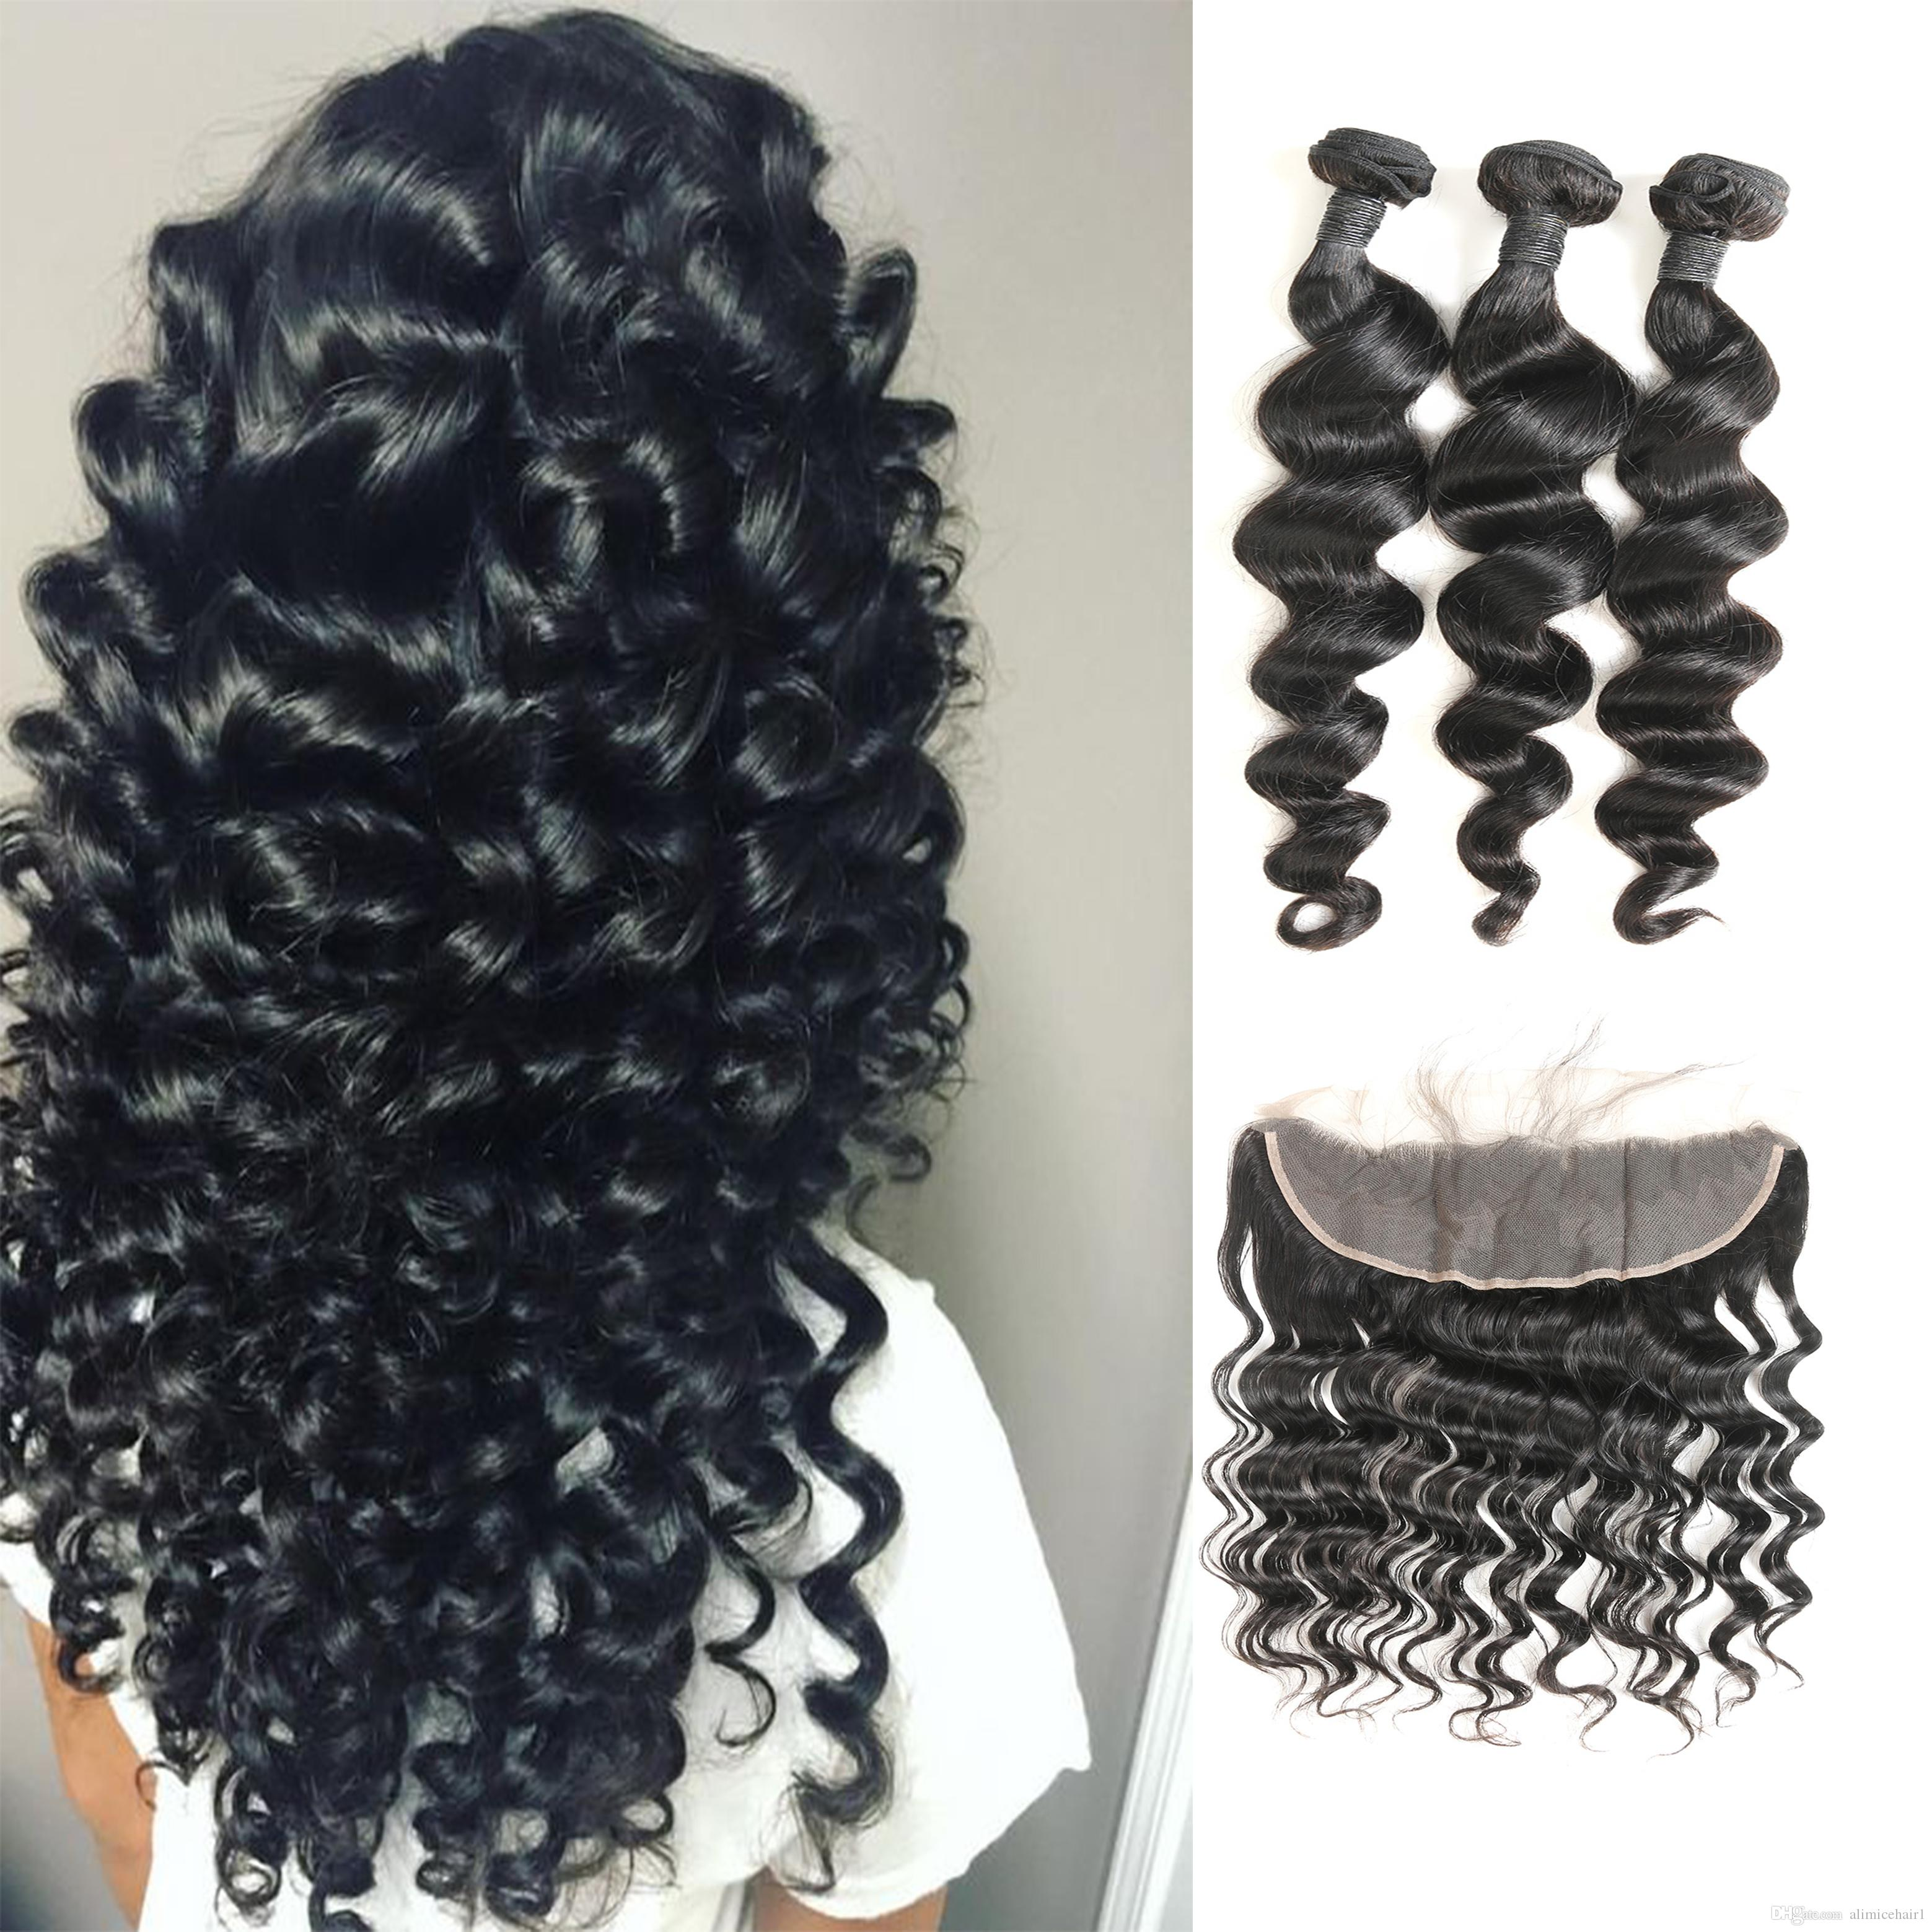 2018 Hot Sale 3 Bundles 100 Human Hair Weaving Silky Malaysian